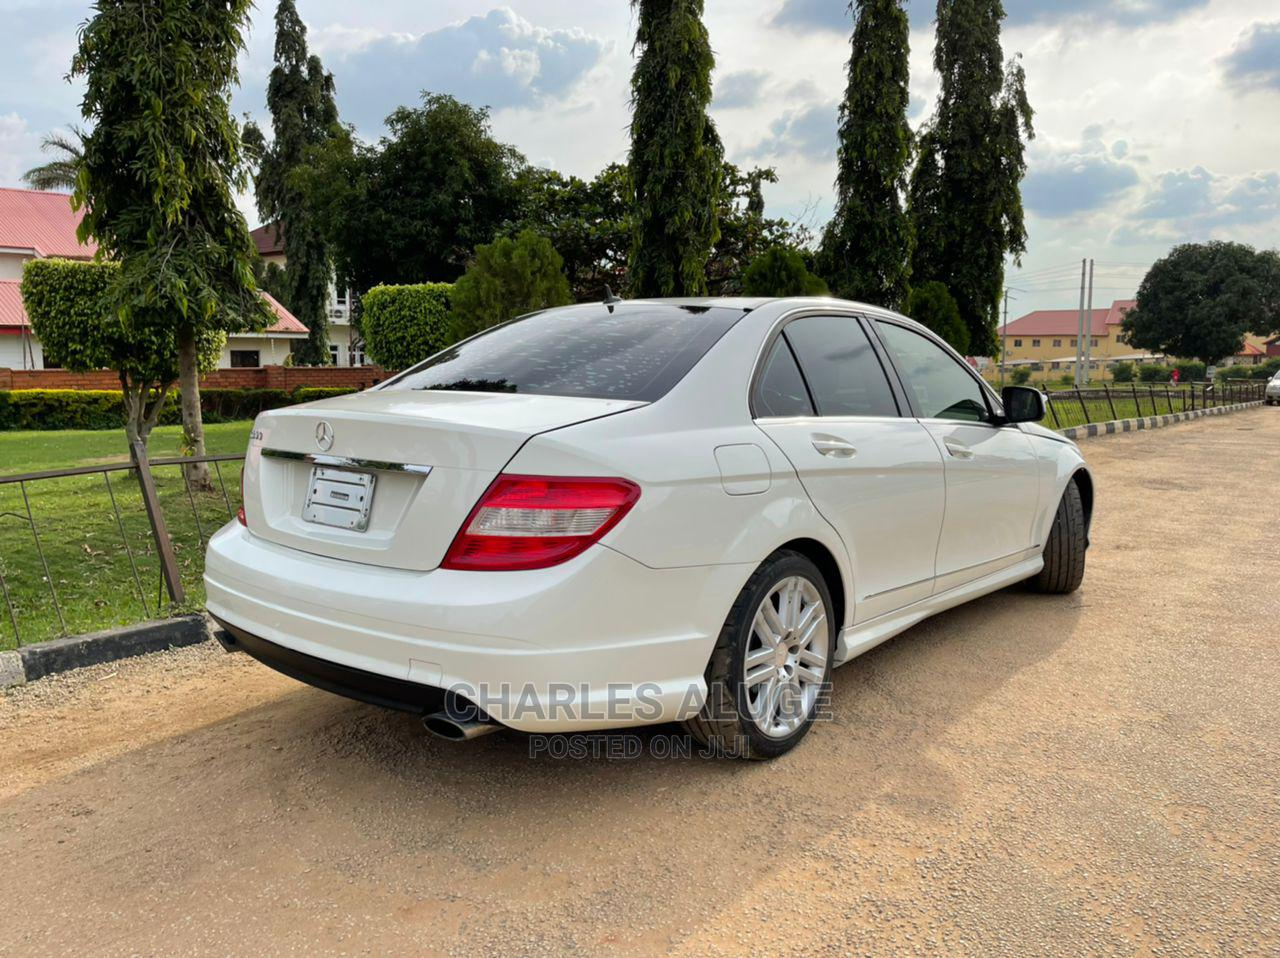 Mercedes-Benz C300 2009 White | Cars for sale in Jahi, Abuja (FCT) State, Nigeria